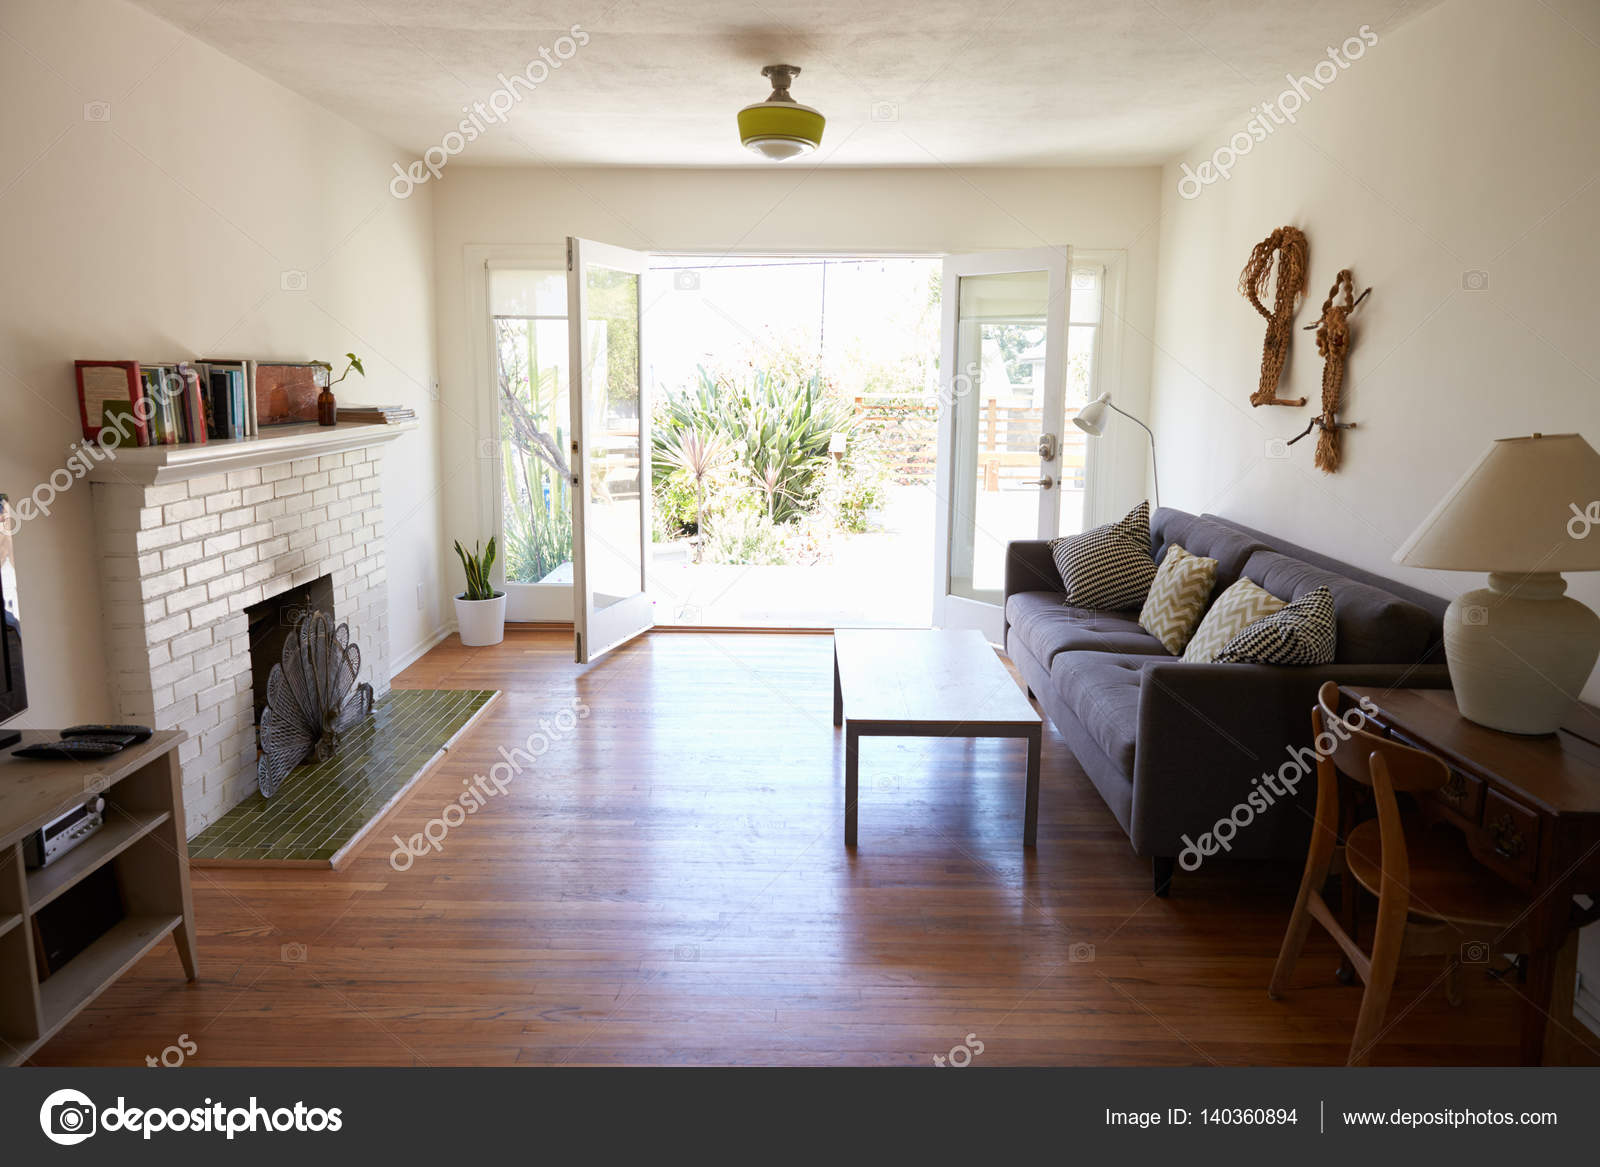 Interieur van moderne lounge u2014 stockfoto © monkeybusiness #140360894